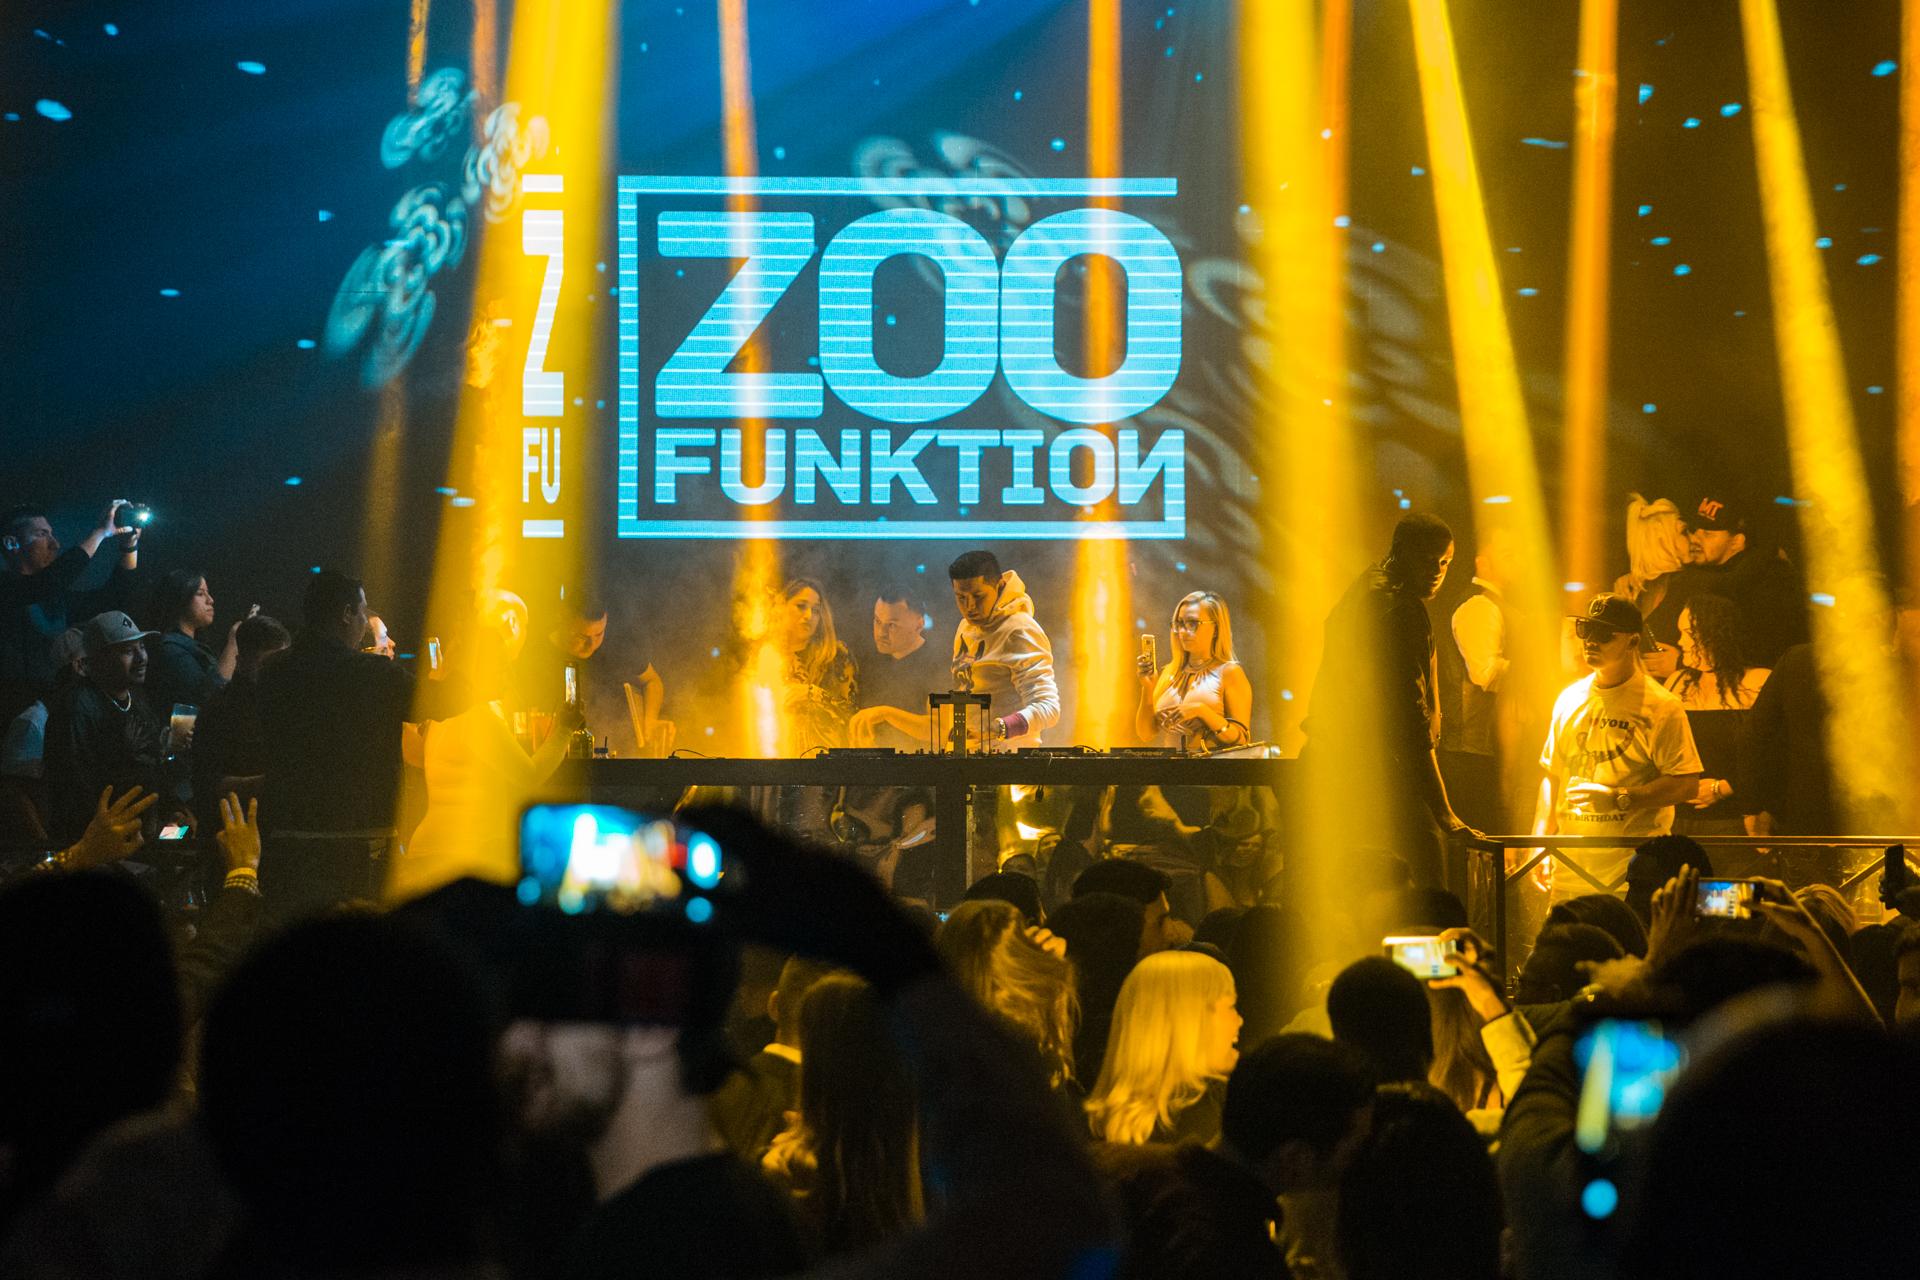 12.16.17 Parq - Zoo Funktion--1.jpg